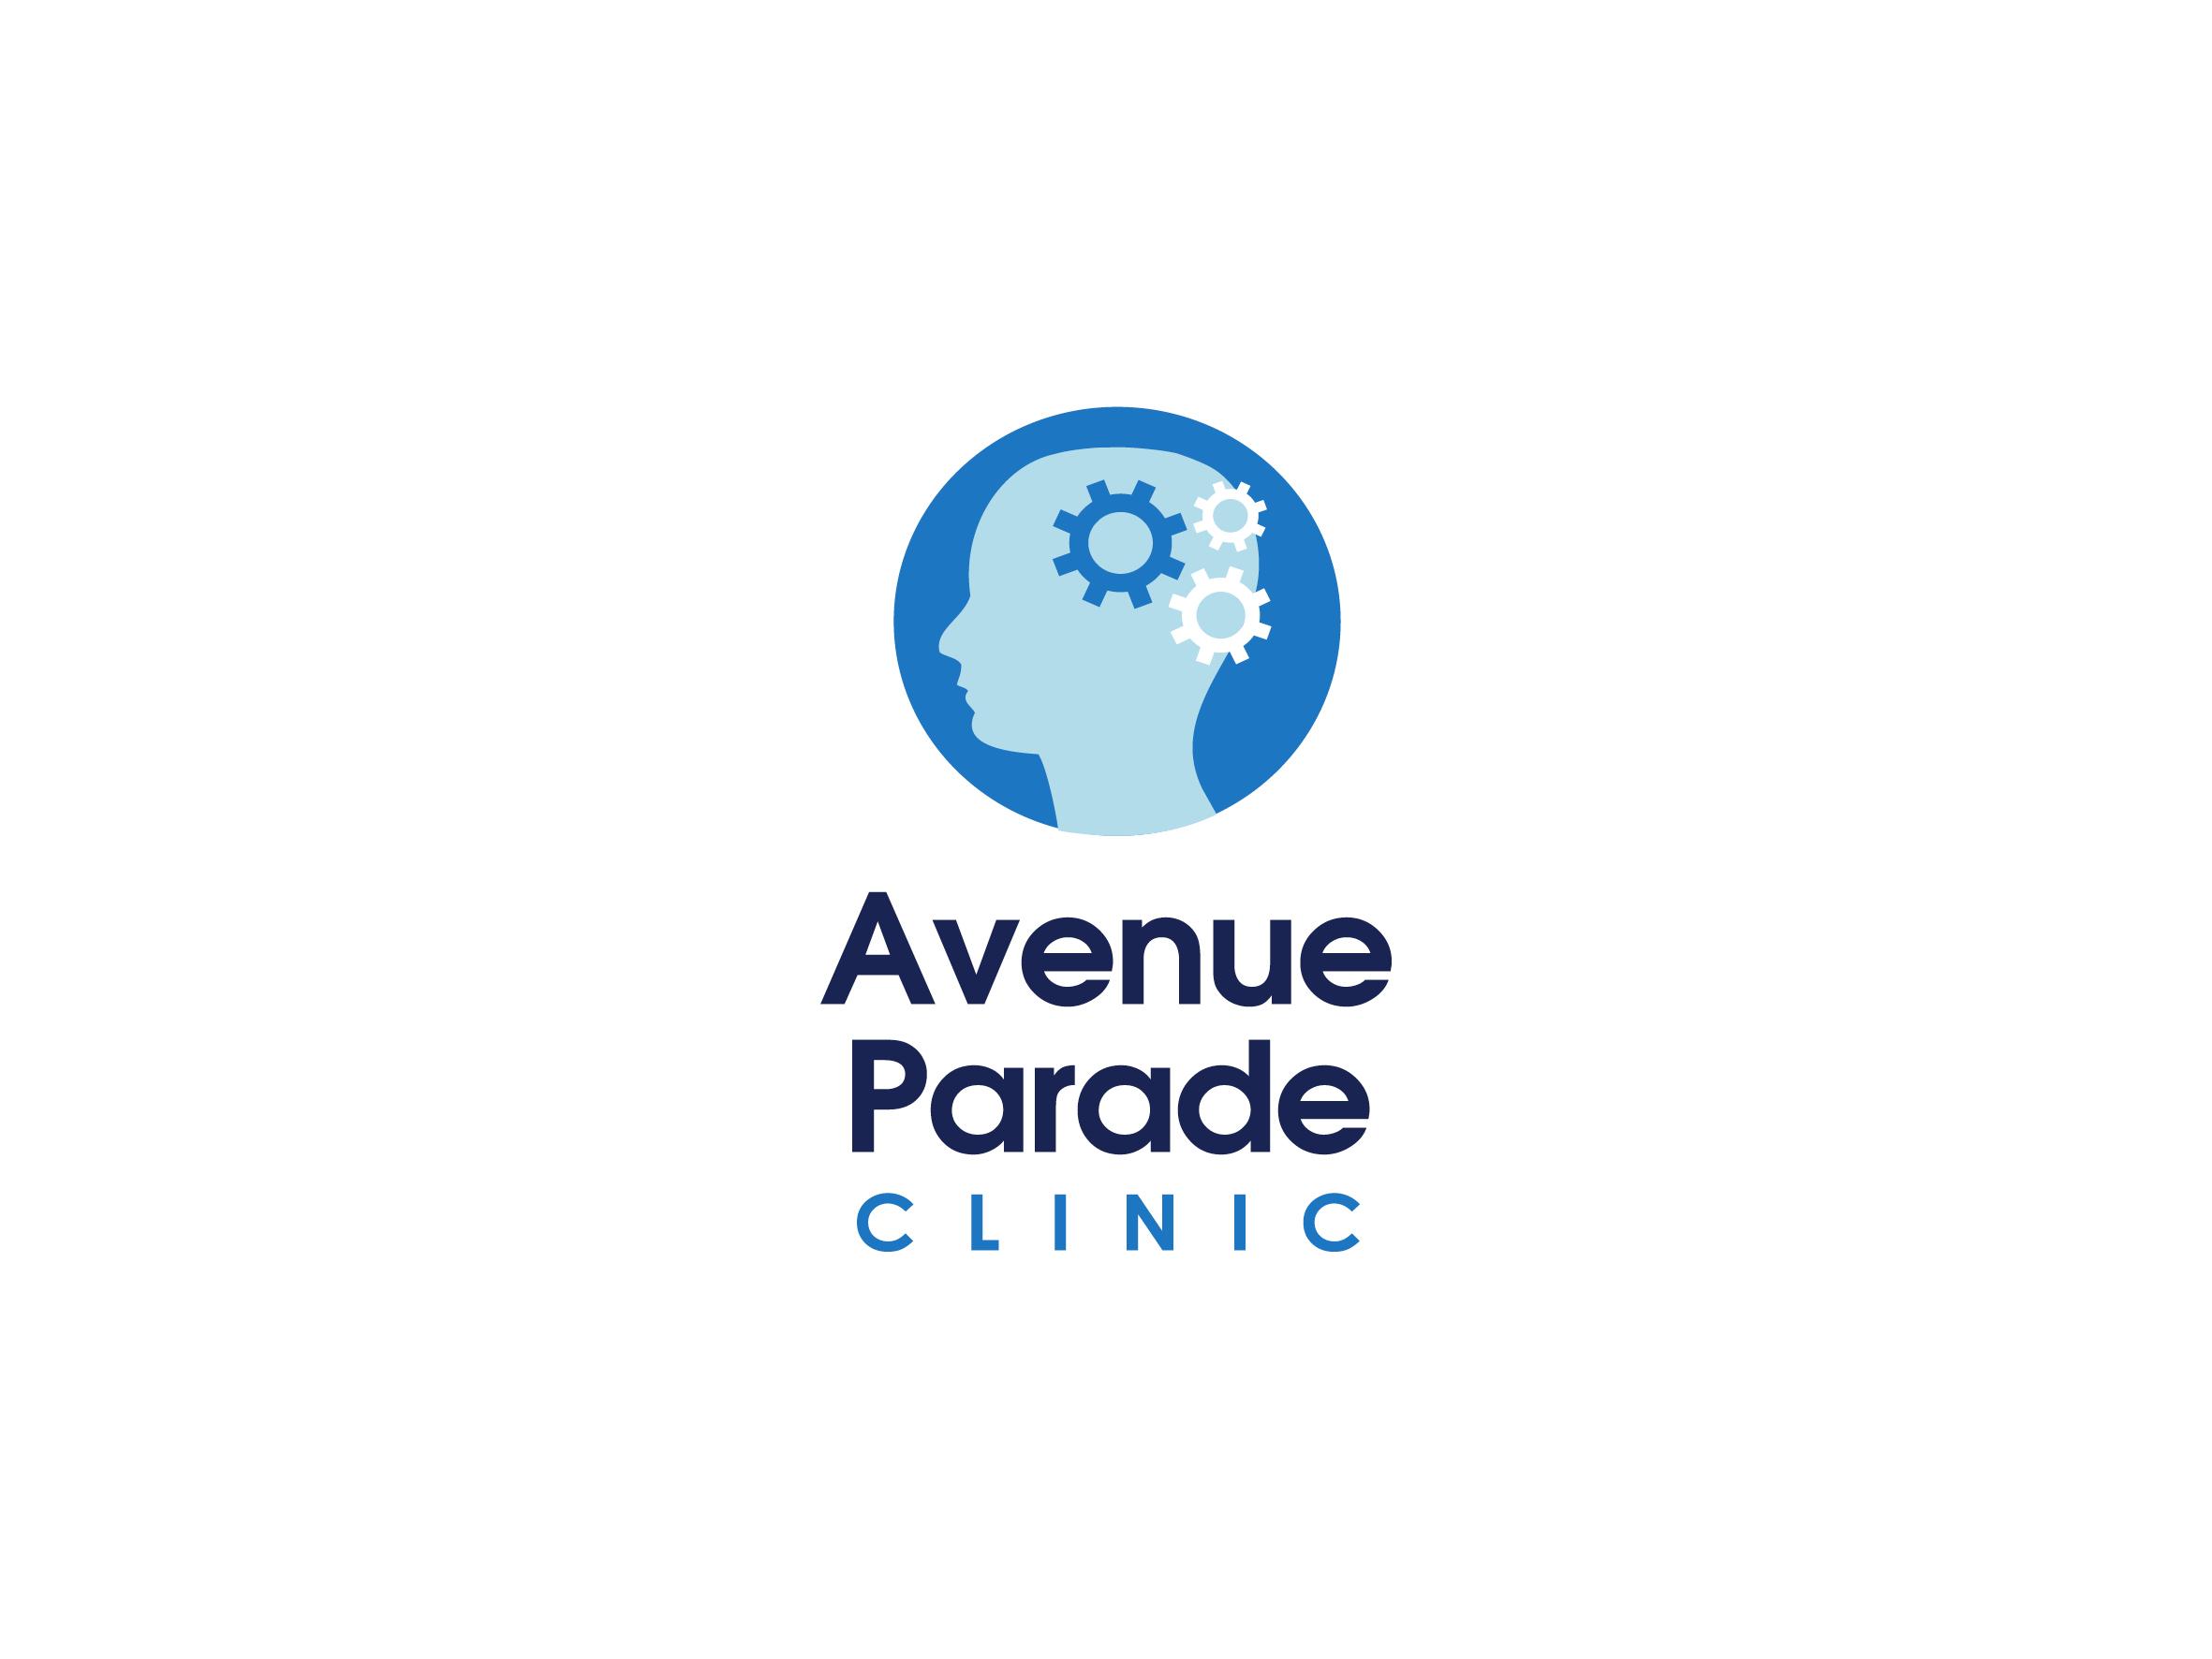 avenue parade clinic logo designed by Dakini Design Saltaire, Shipley, Bradford